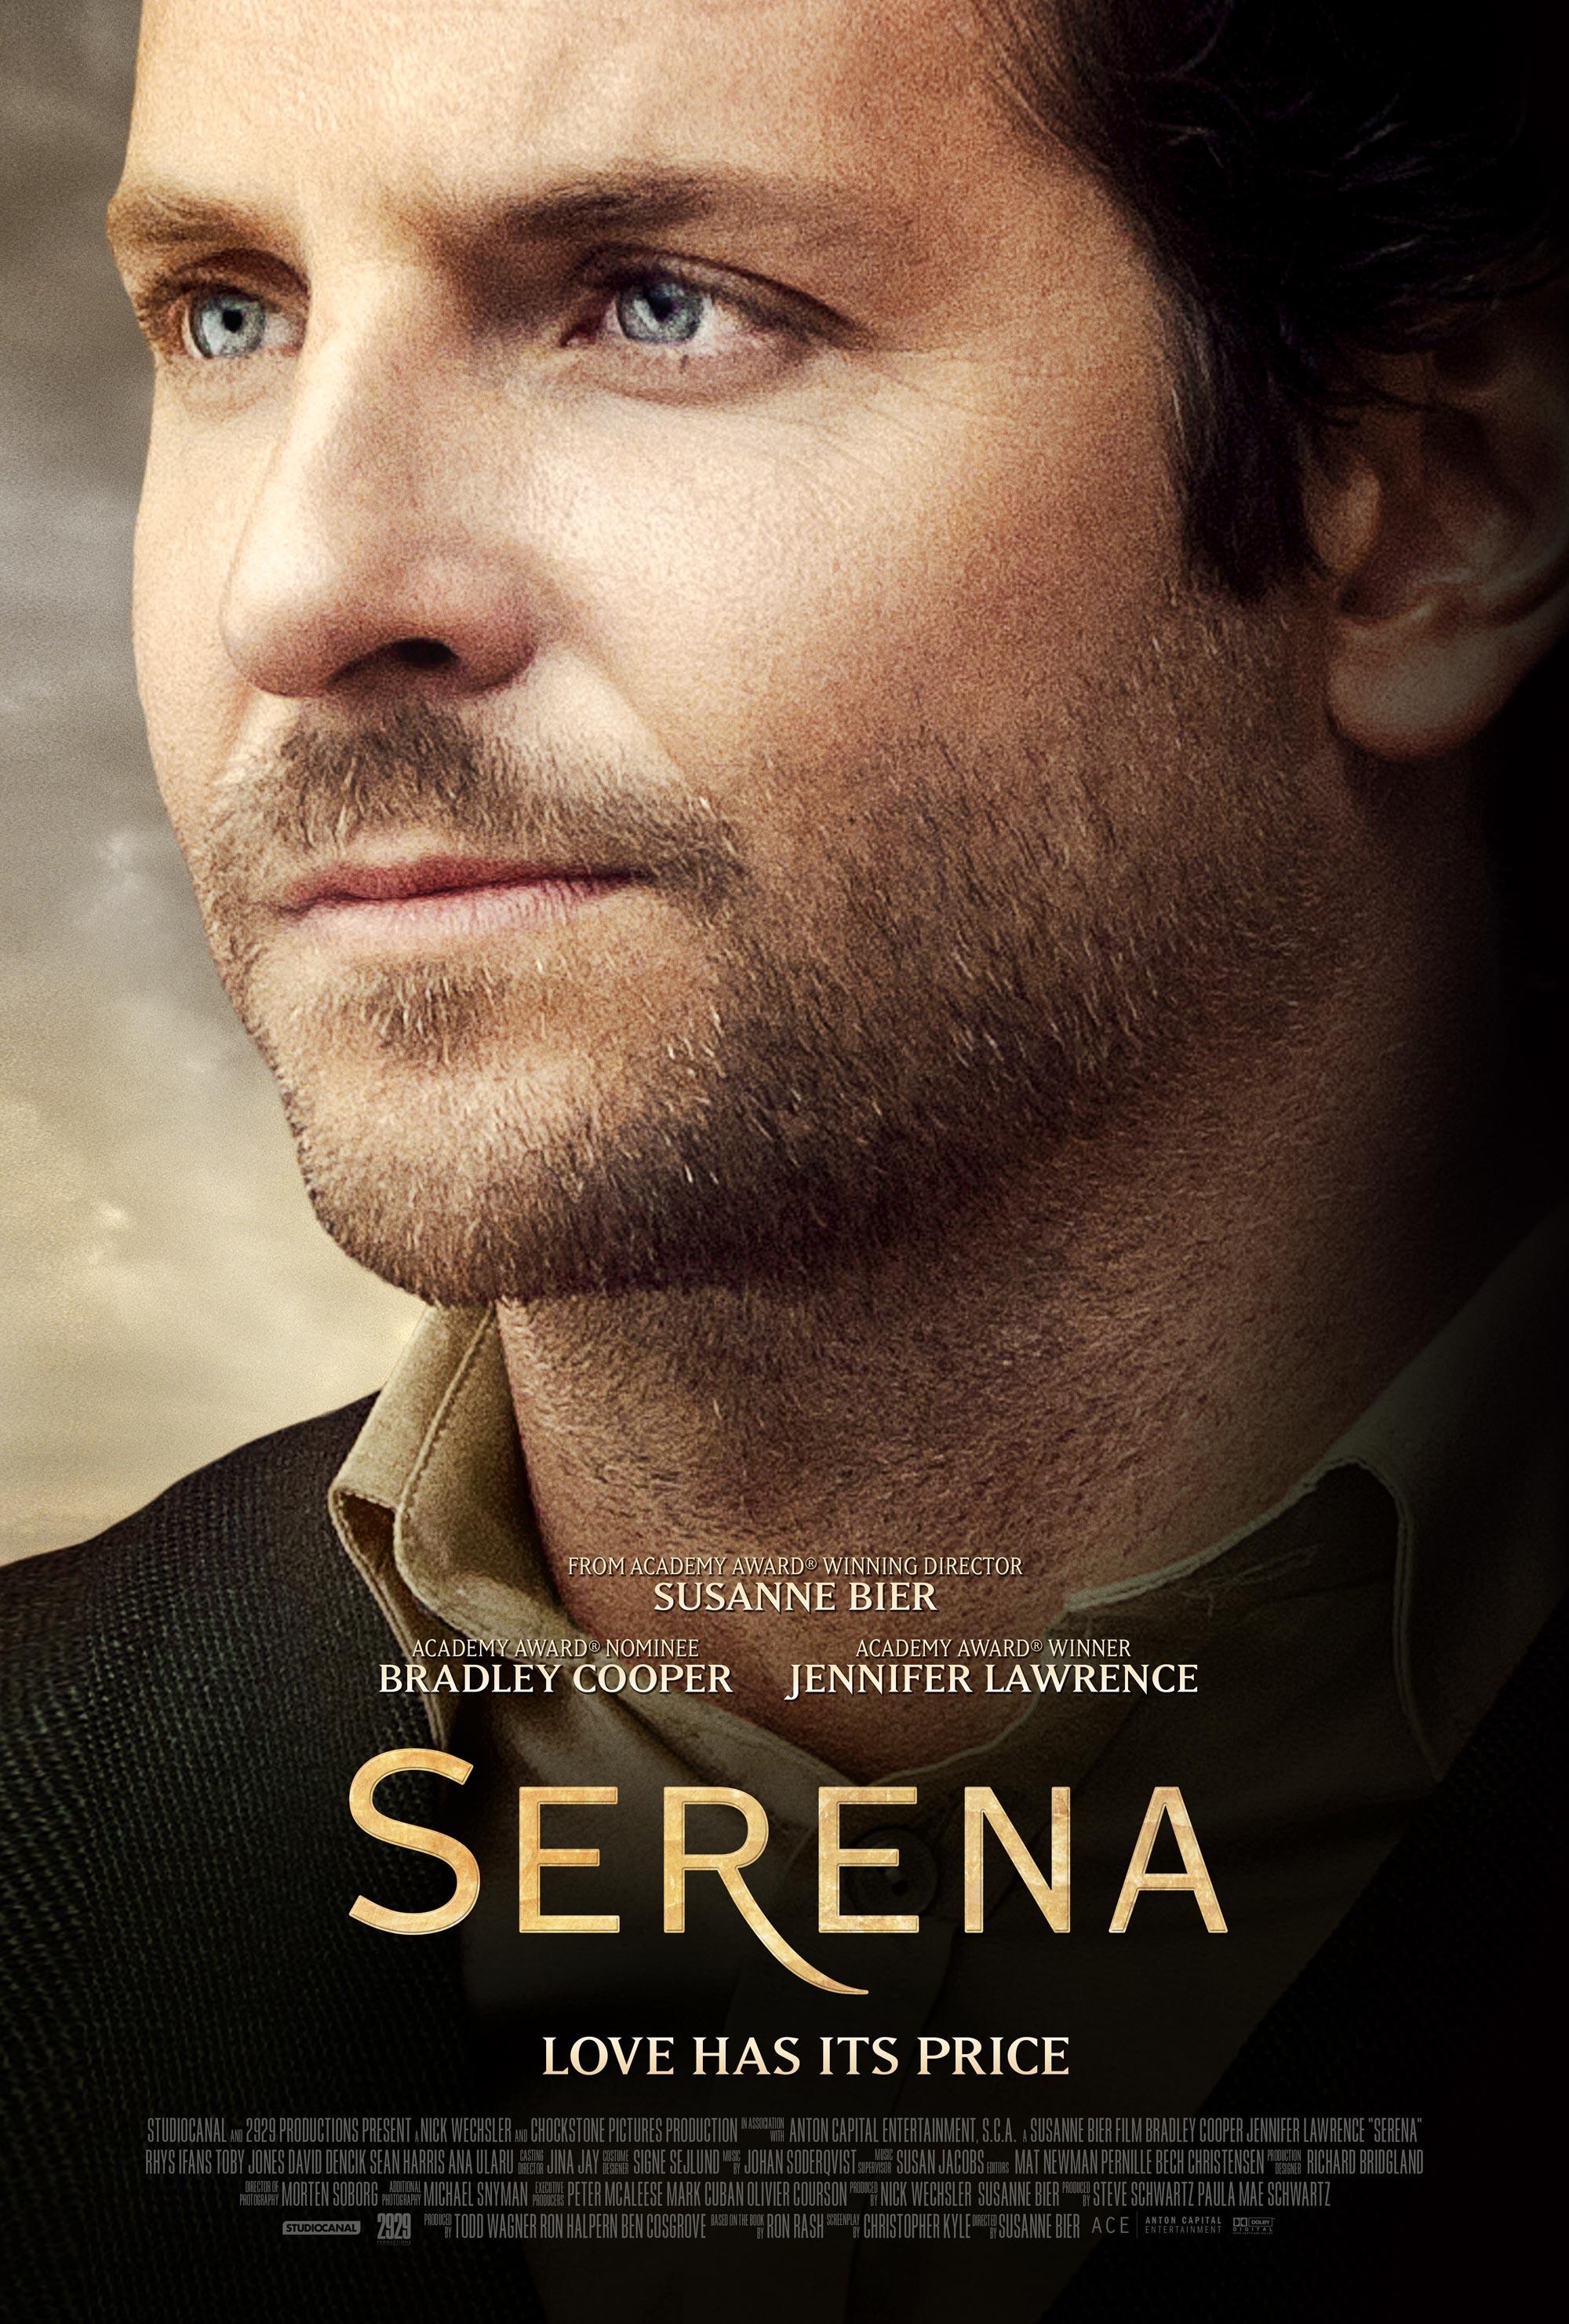 Serena Bradley Cooper